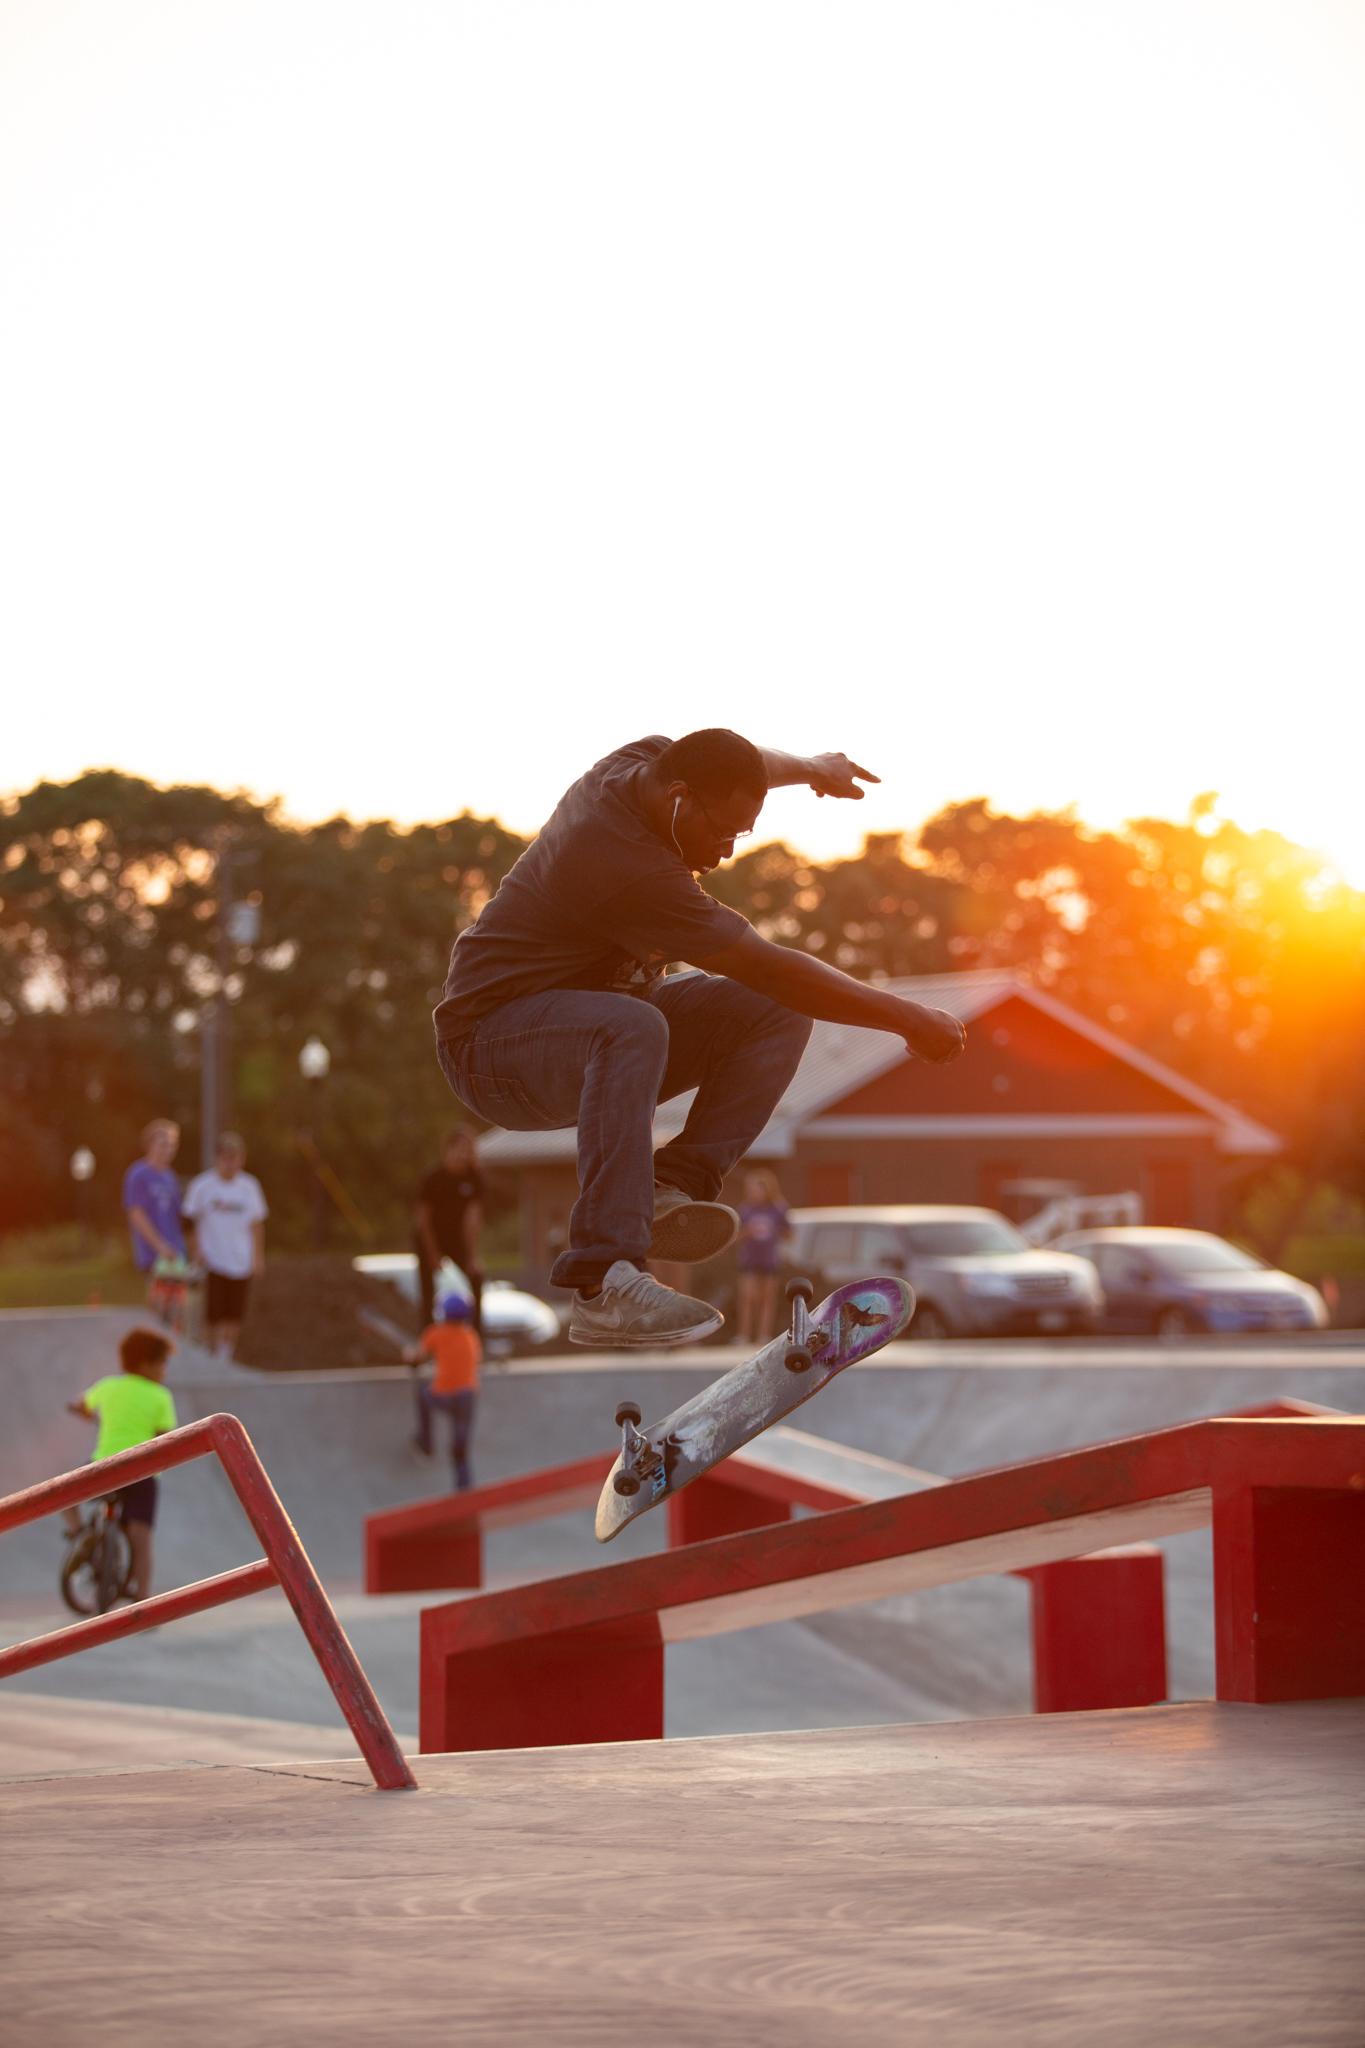 Newark_Skate_Park_0001.jpg